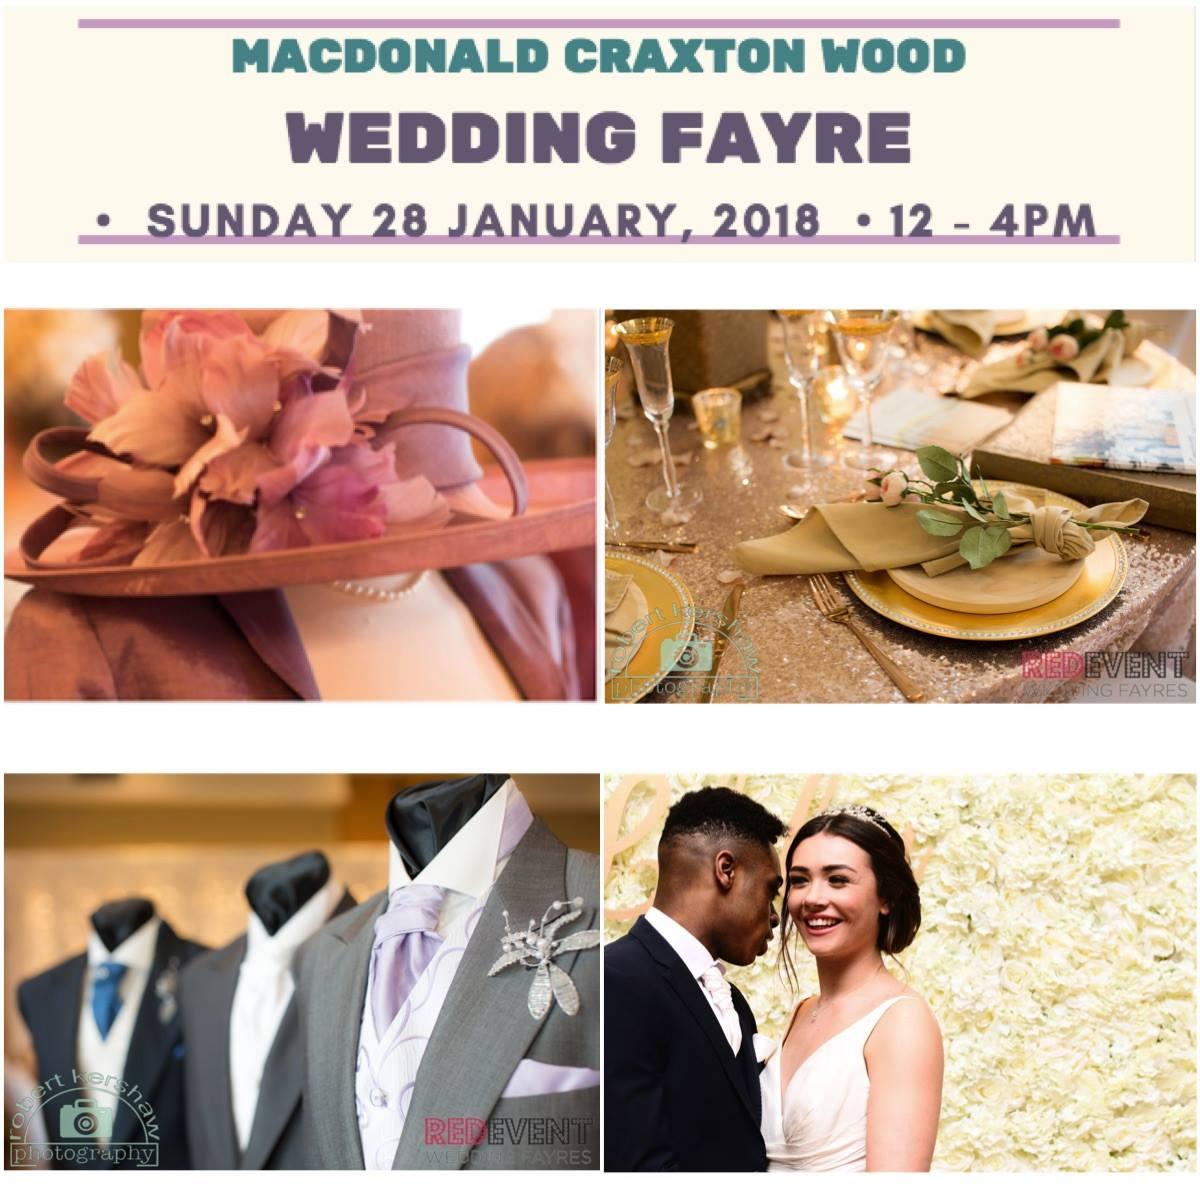 1. Macdonald Craxton Wood Wedding Fayre Chester Cheshire WeddingFair Red Event Wedding Shows Merseyside.jpg